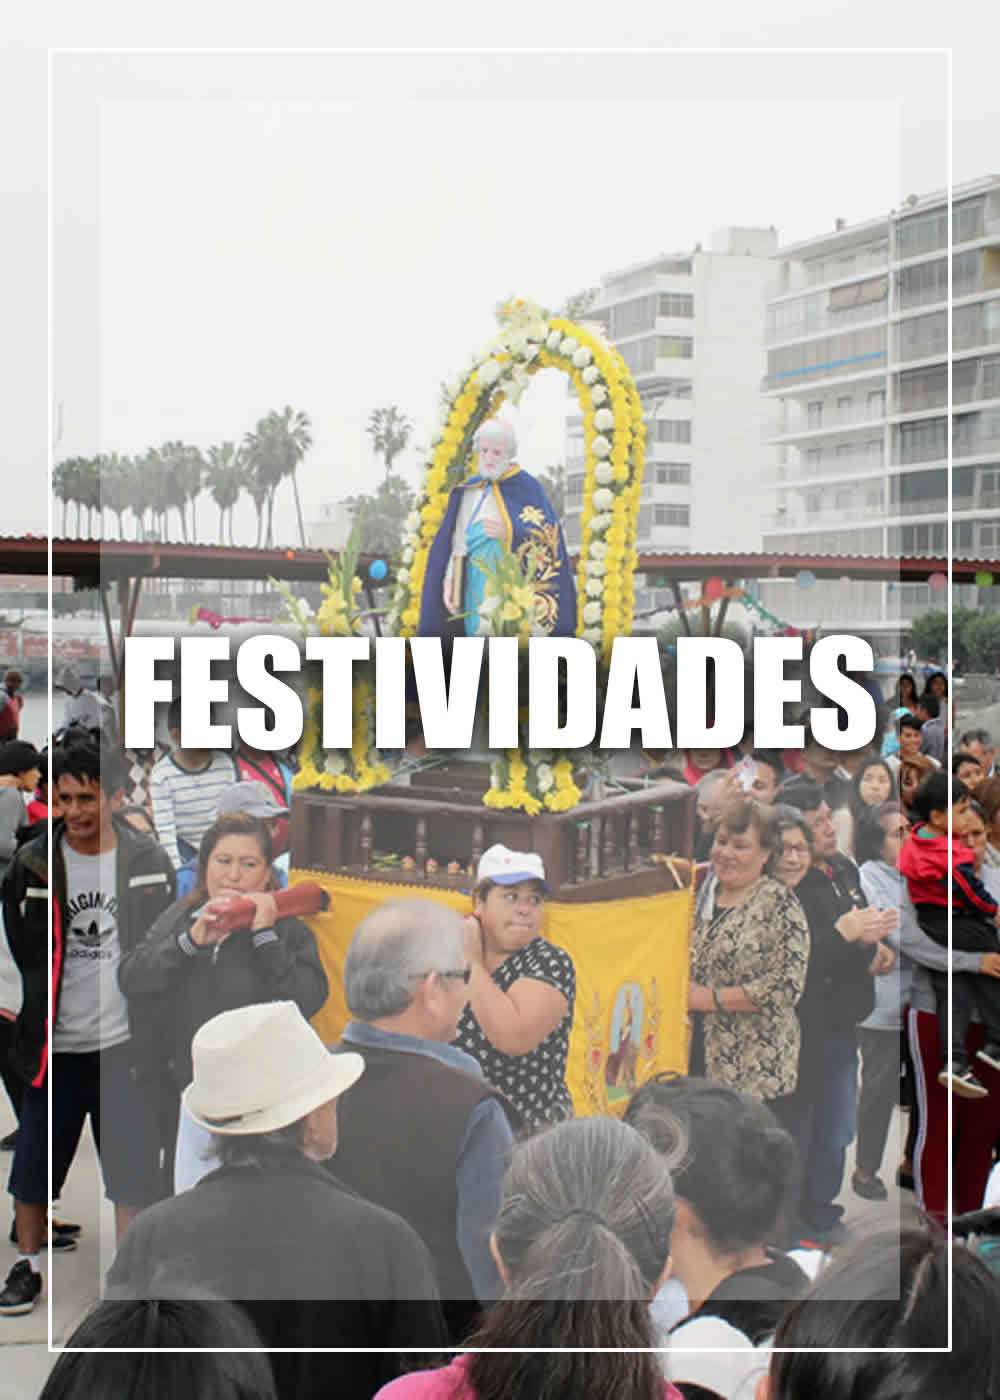 TURISMO EN ANCON | FESTIVIDADES EN ANCON